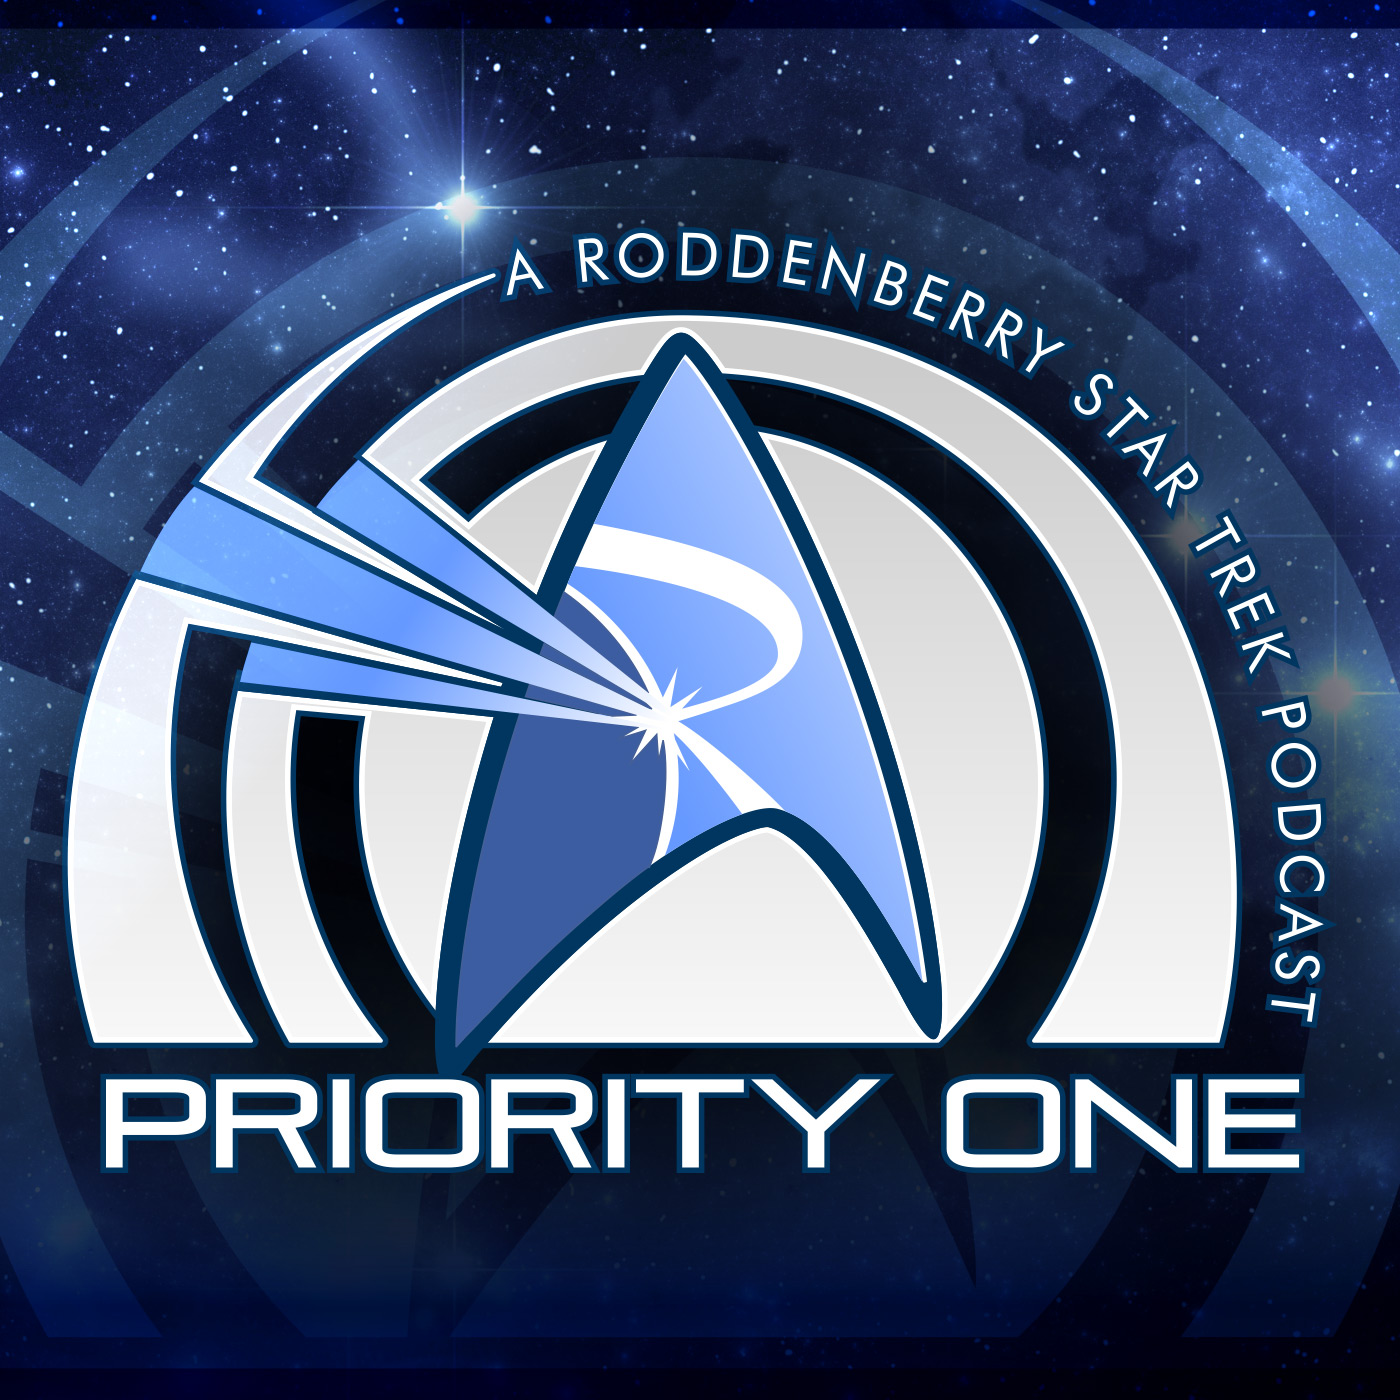 Artwork for 441 - CCXP, ViacomCBS, And STO Interviews   Priority One: A Roddenberry Star Trek Podcast